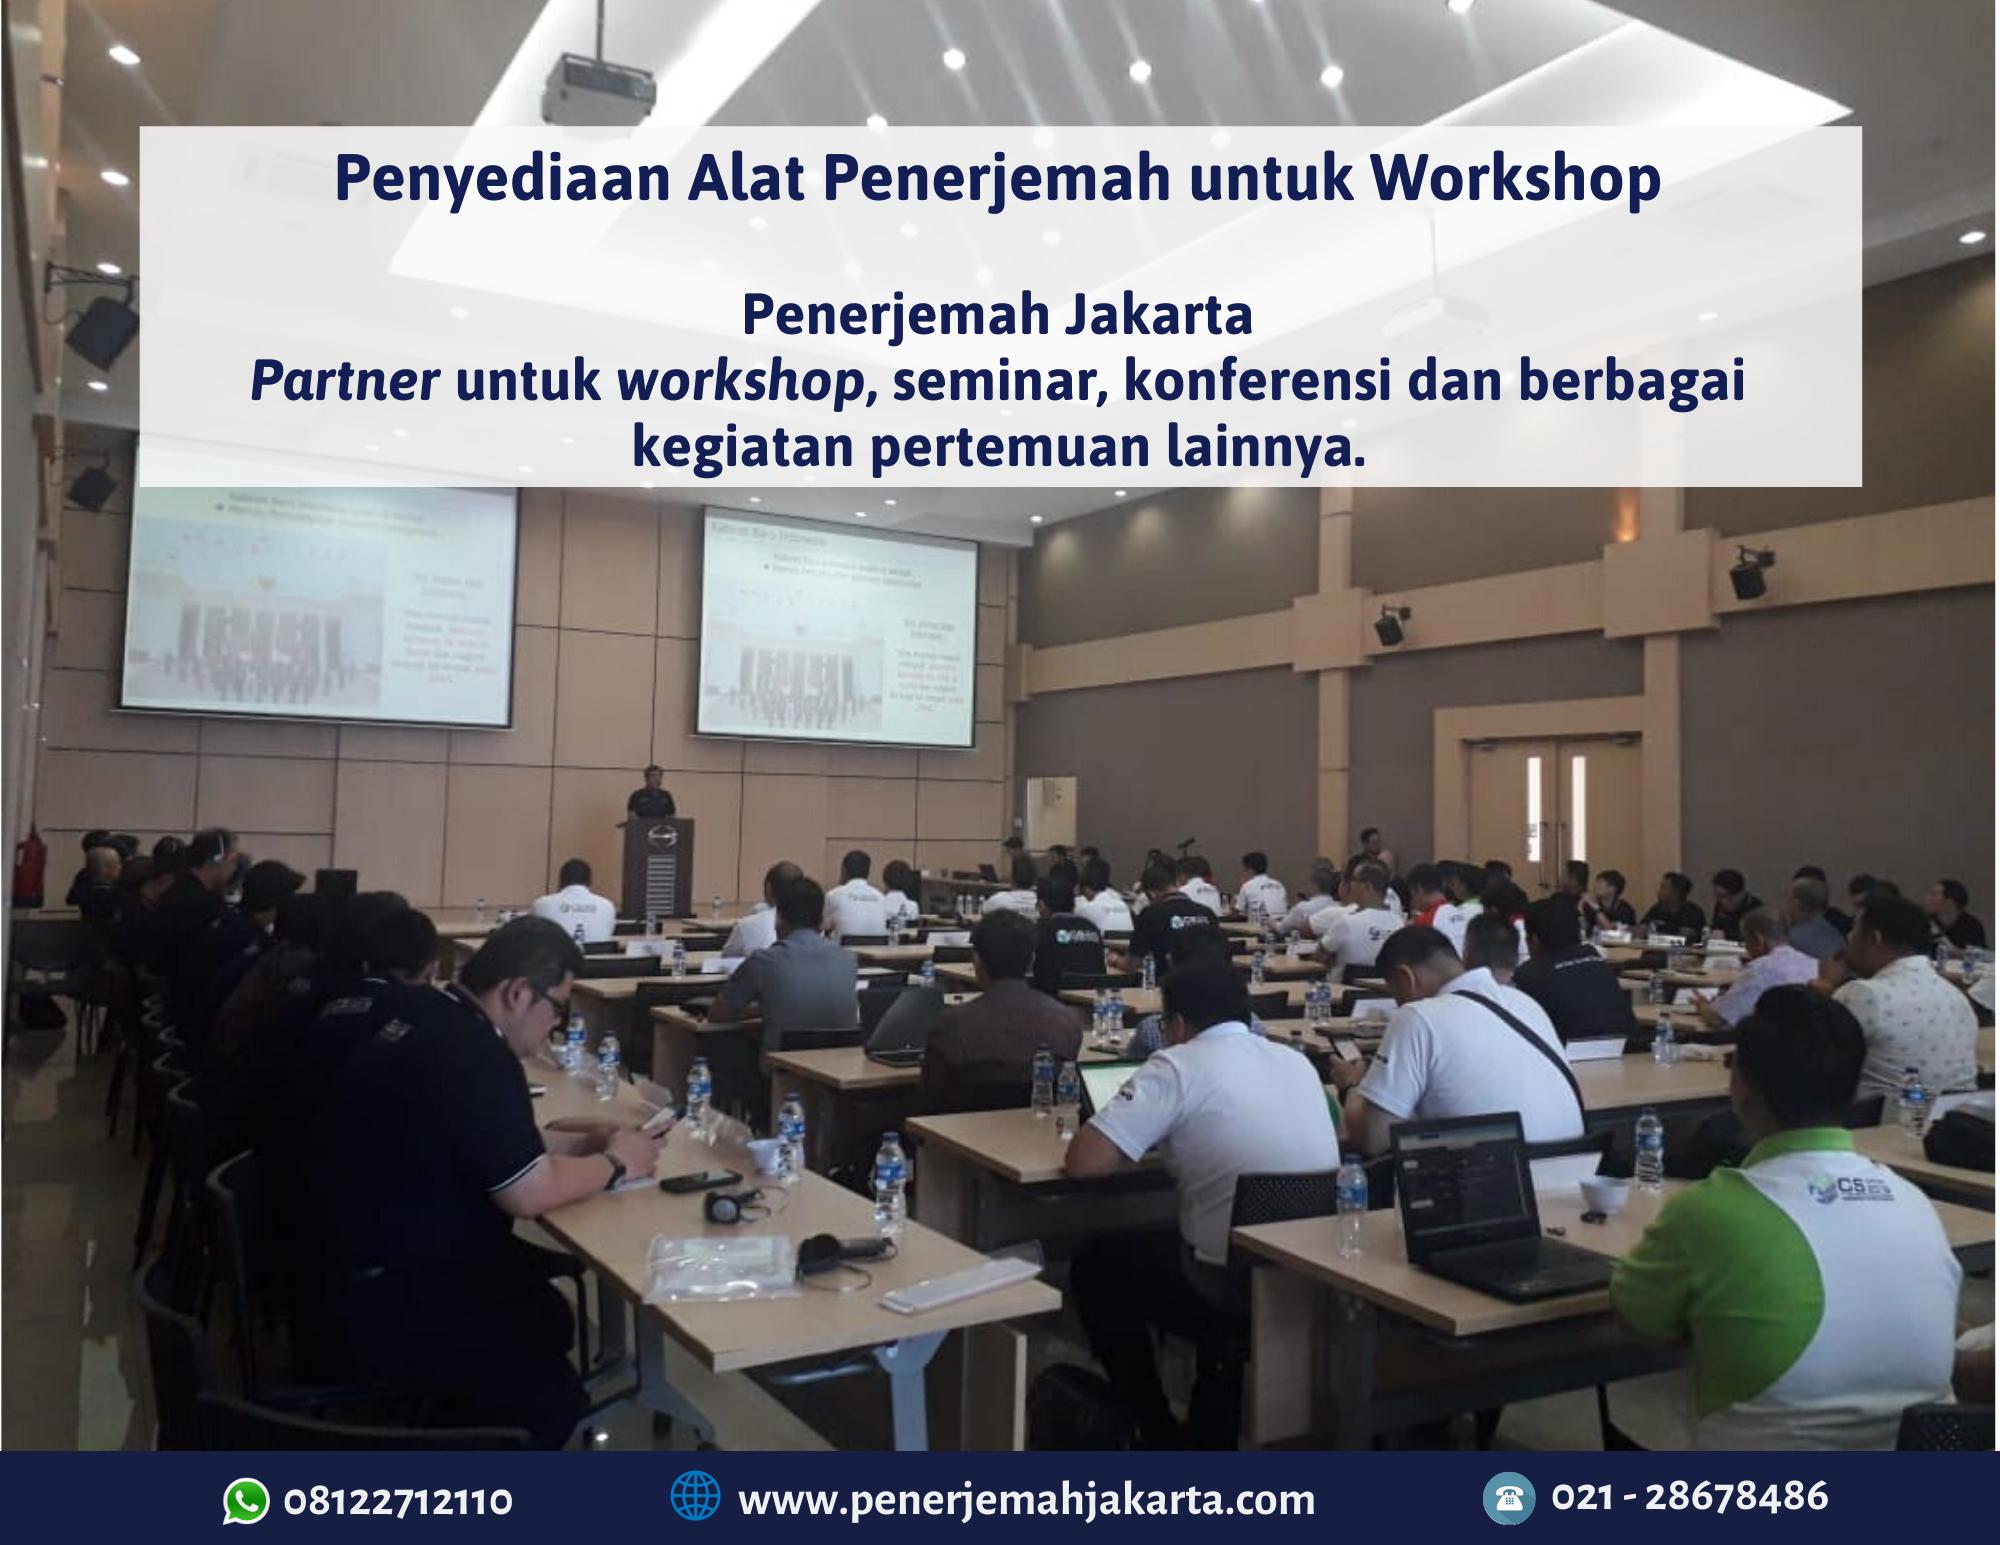 Sewa Alat Penerjemah untuk Workshop